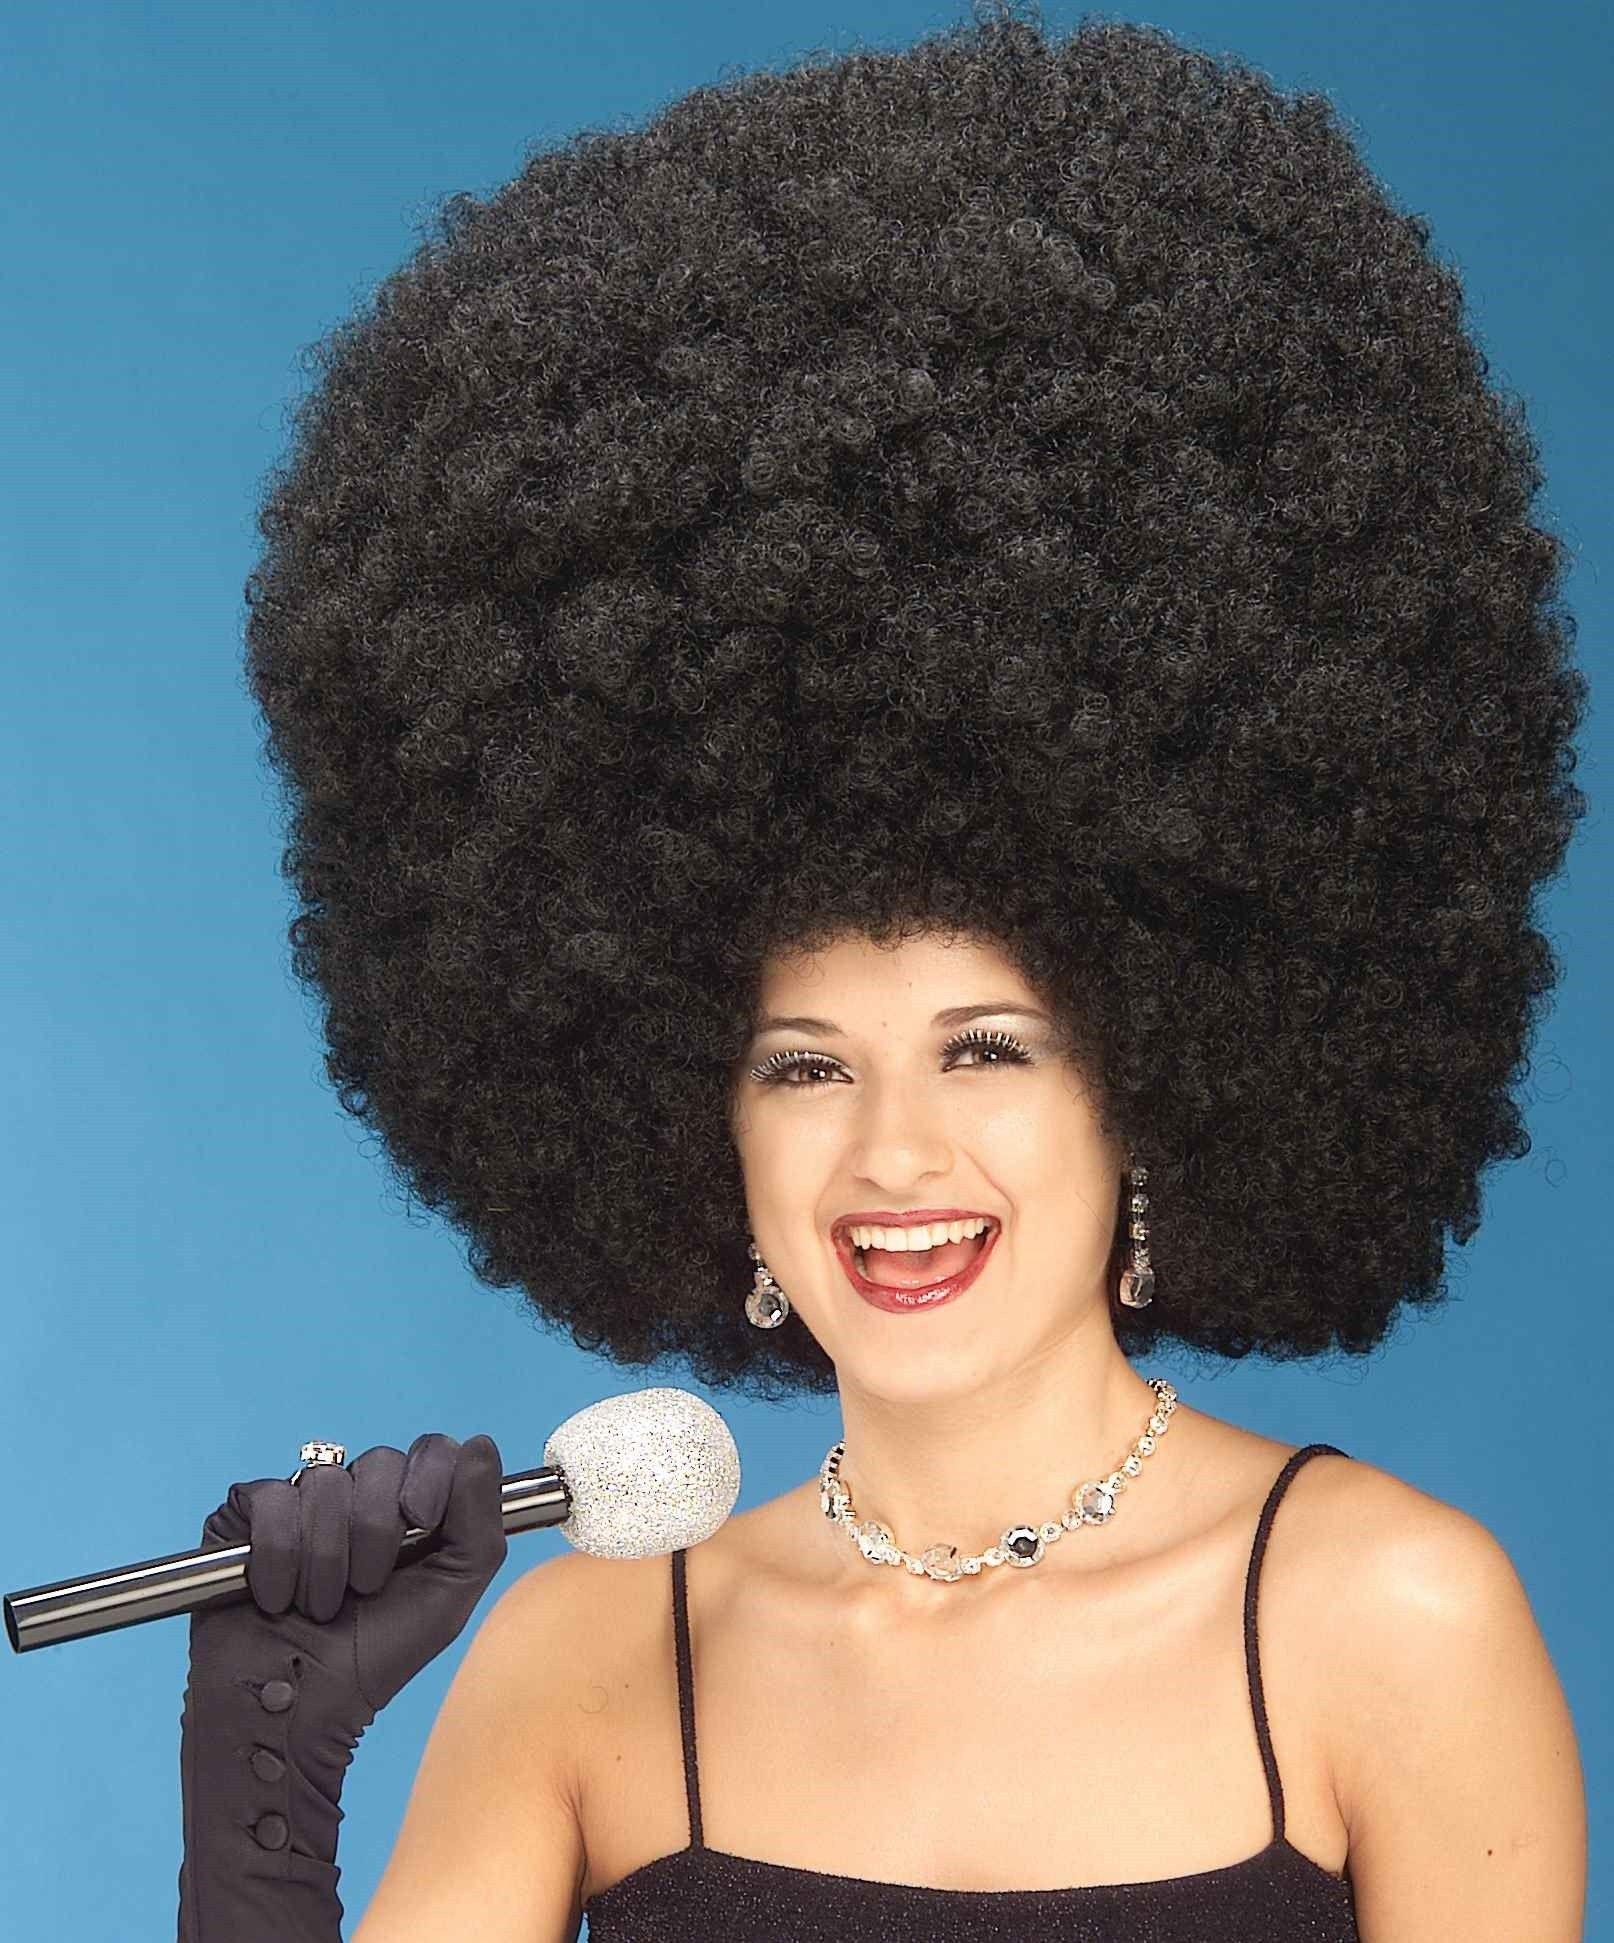 AVIATOR SUNGLASSES Mens Ladies curly clown fancy dress 1970s 70s 60s AFRO WIG